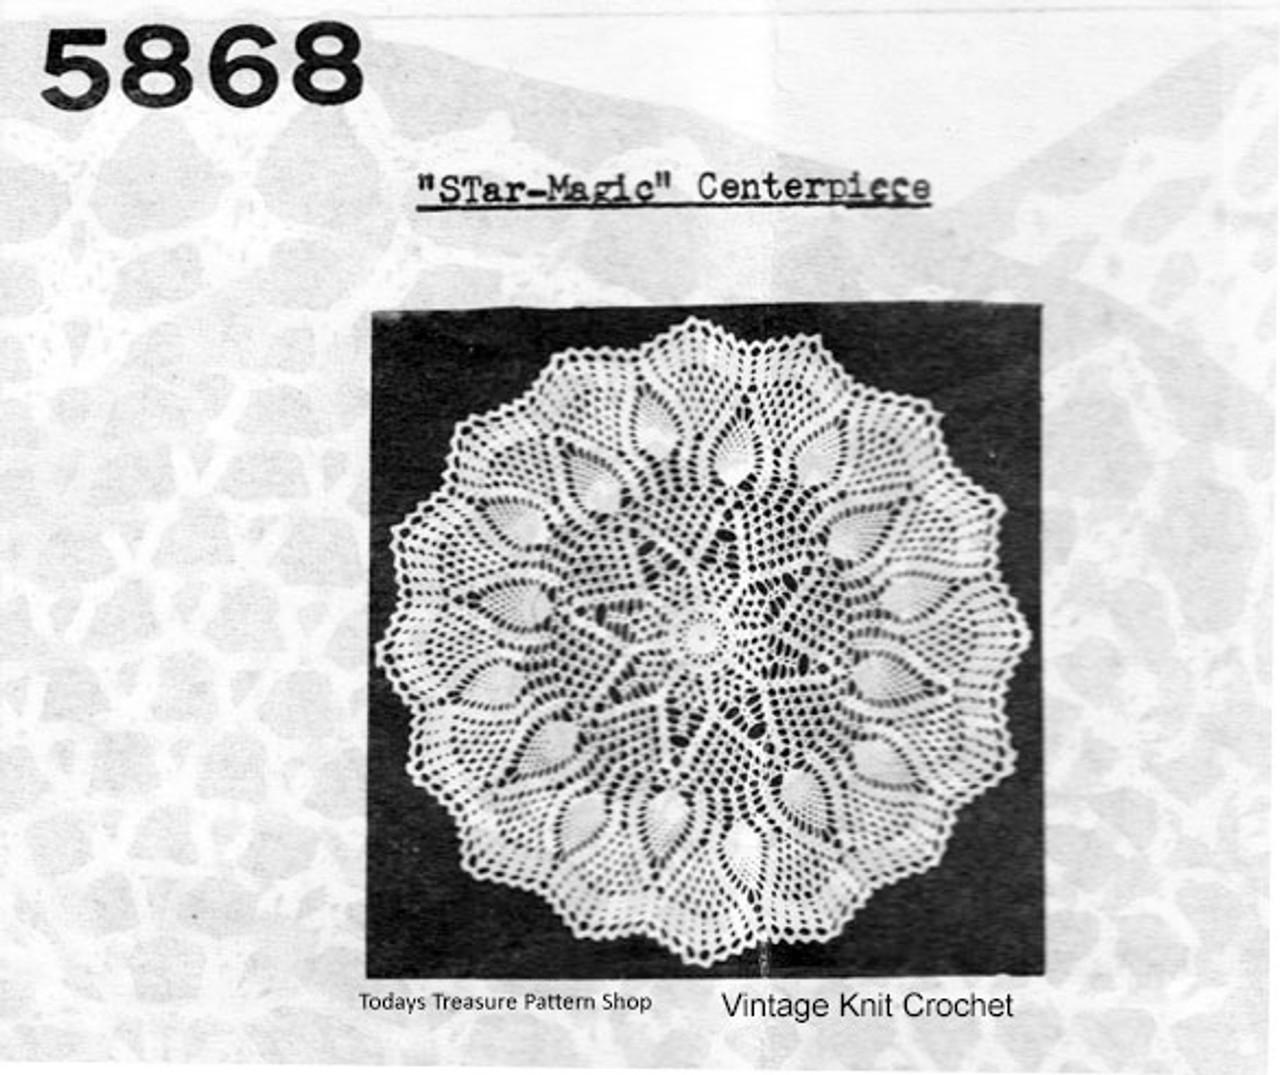 Mail Order Crochet Pineapple Star Doily Pattern No 5868